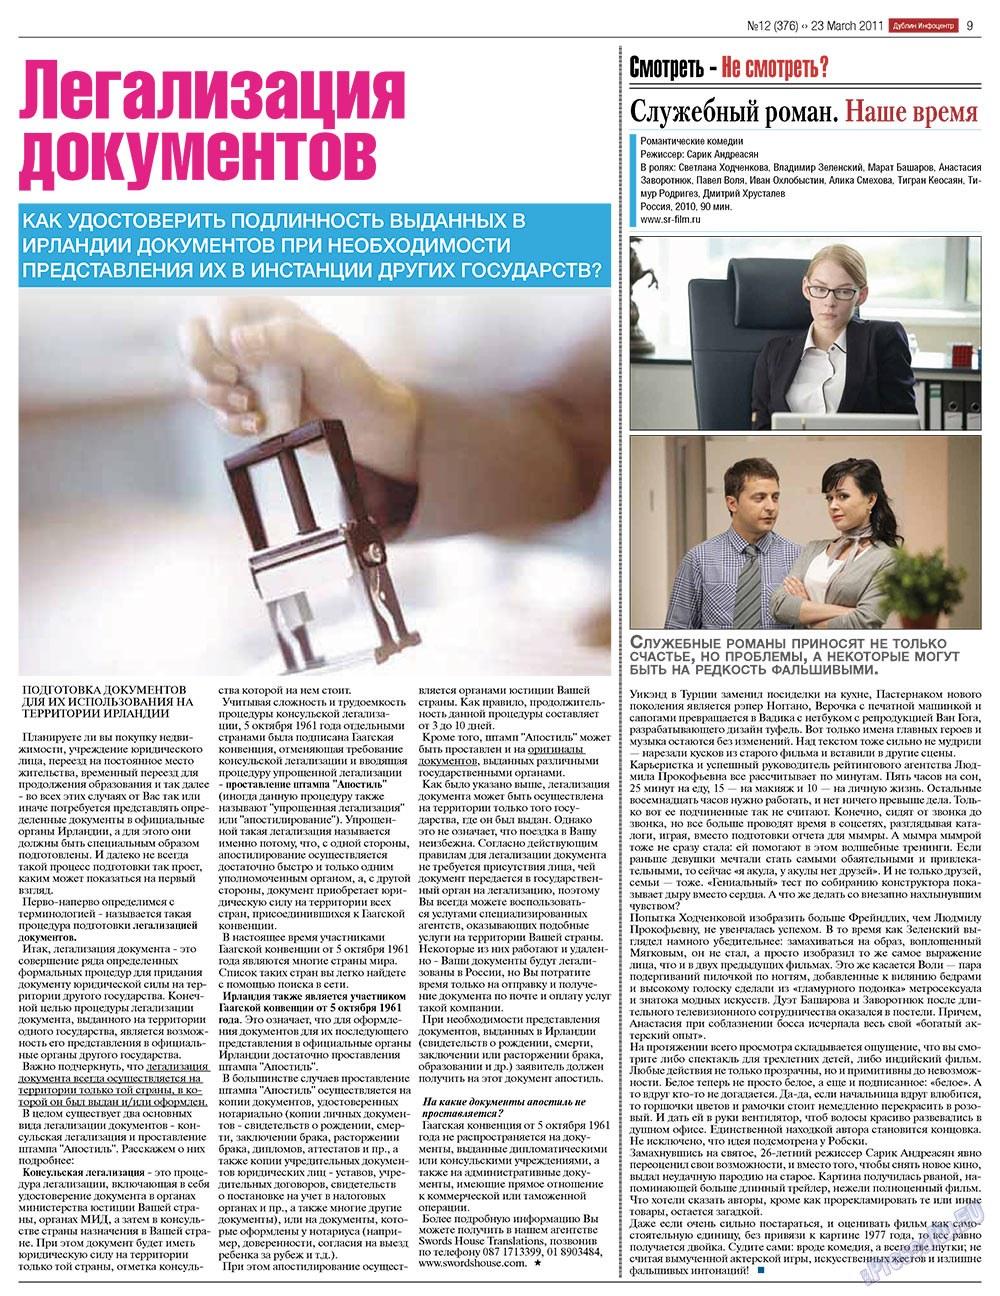 Дублин инфоцентр (газета). 2011 год, номер 12, стр. 9